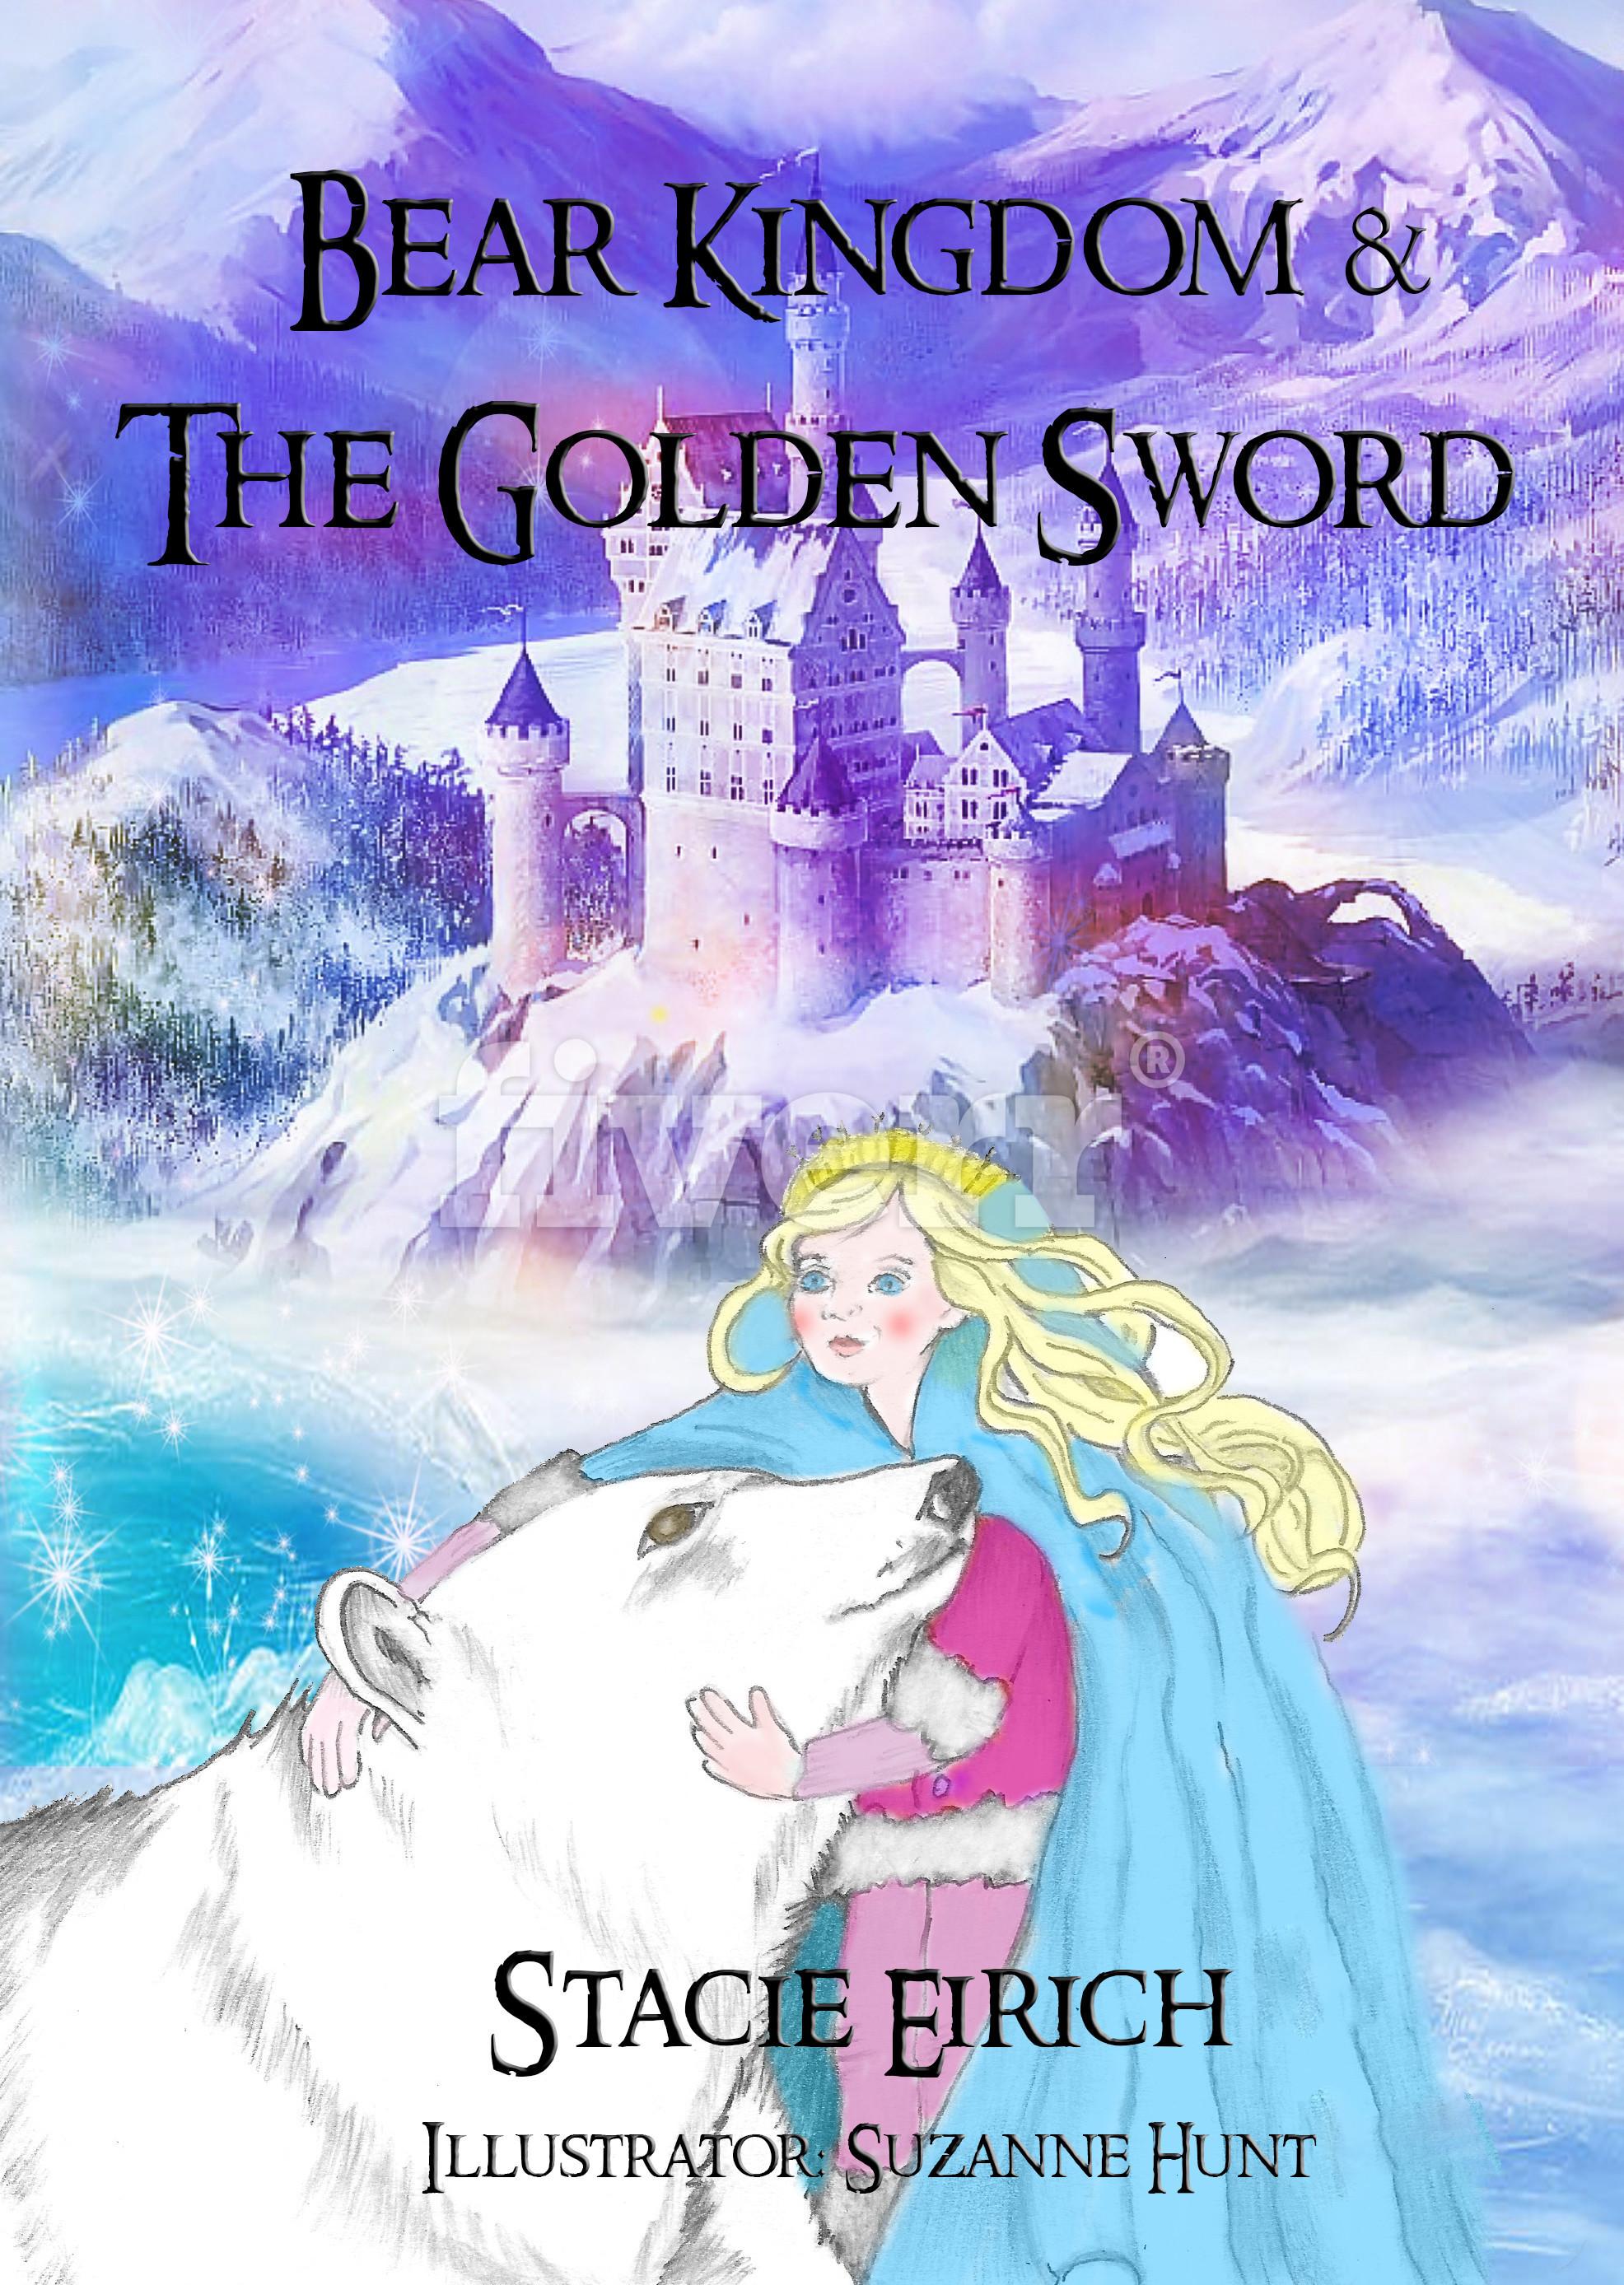 Bear Kingdom & The Golden Sword